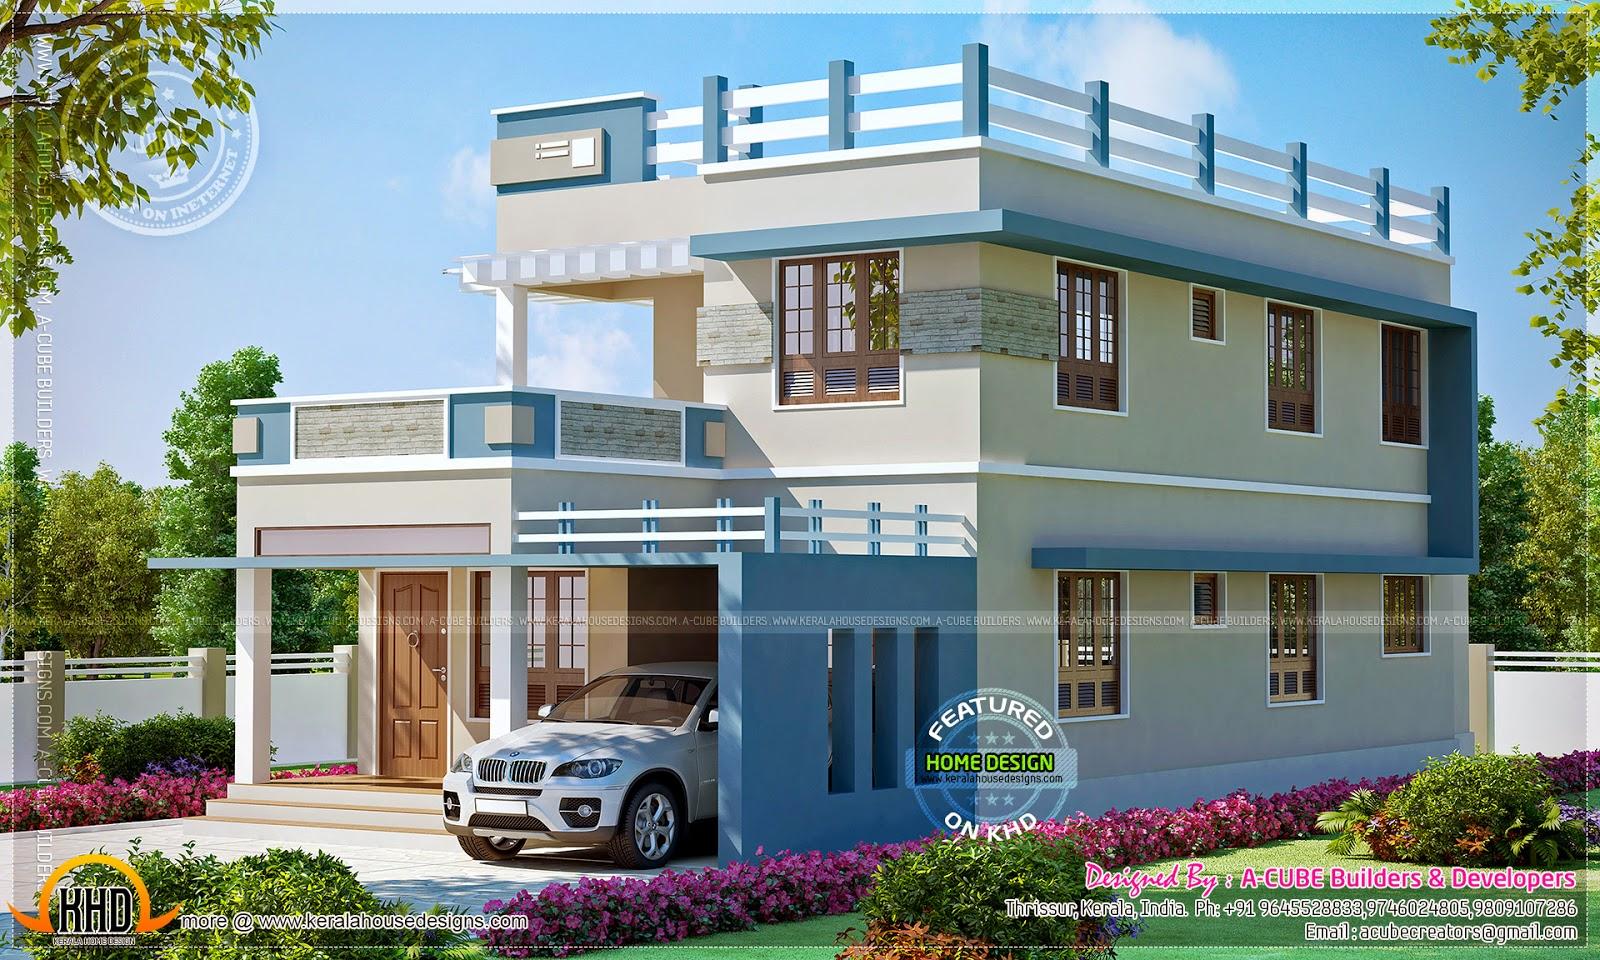 square feet home design kerala home design floor plans florida home builder woodland enterprises poplar home floor plans